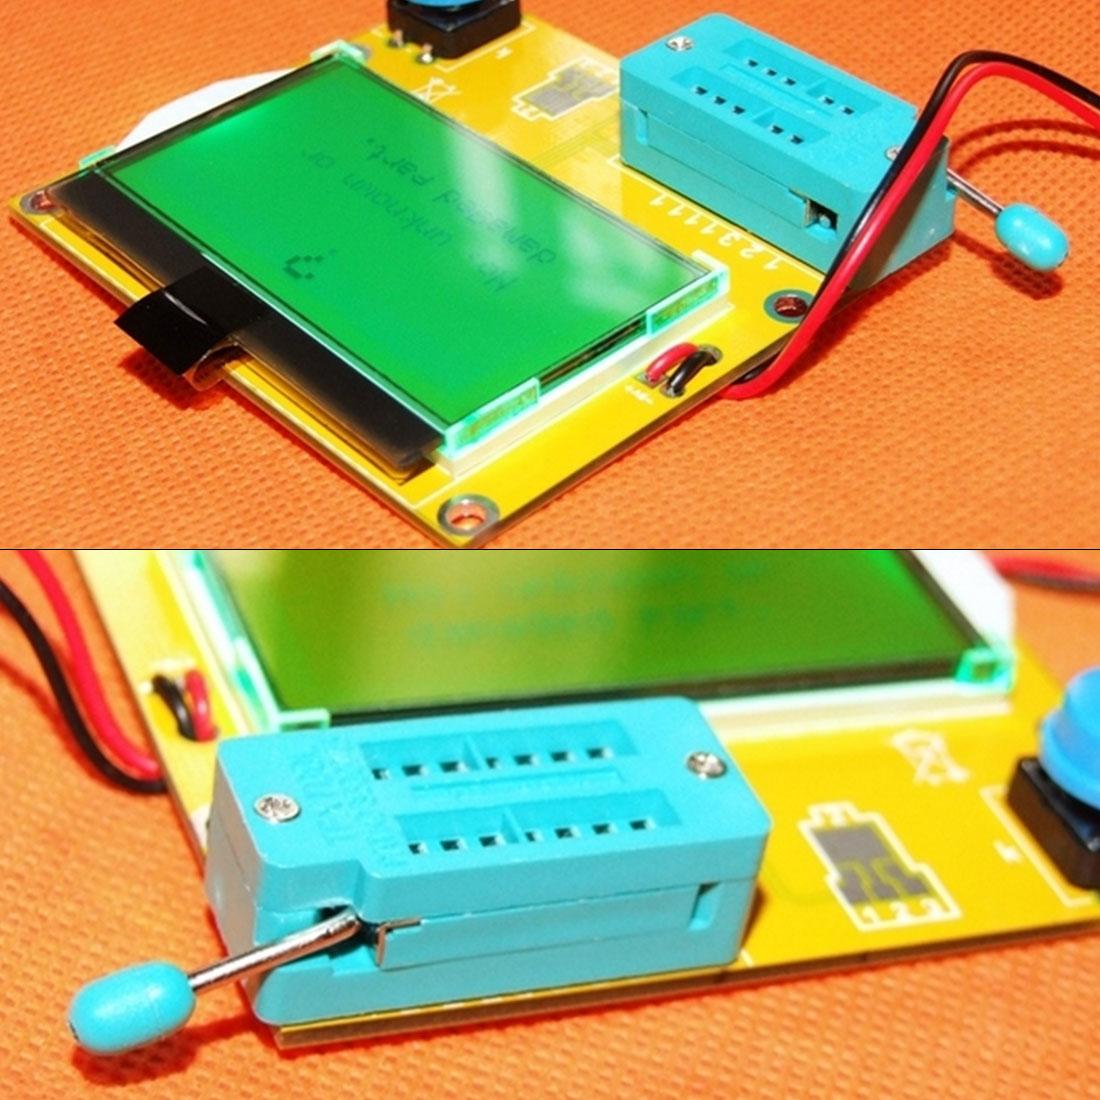 1PC M328 LCR-T4 12846 LCD Digital Transistor Tester Meter Backlight Diode Triode Capacitance ESR Meter MOS/PNP/NPN L/C/R